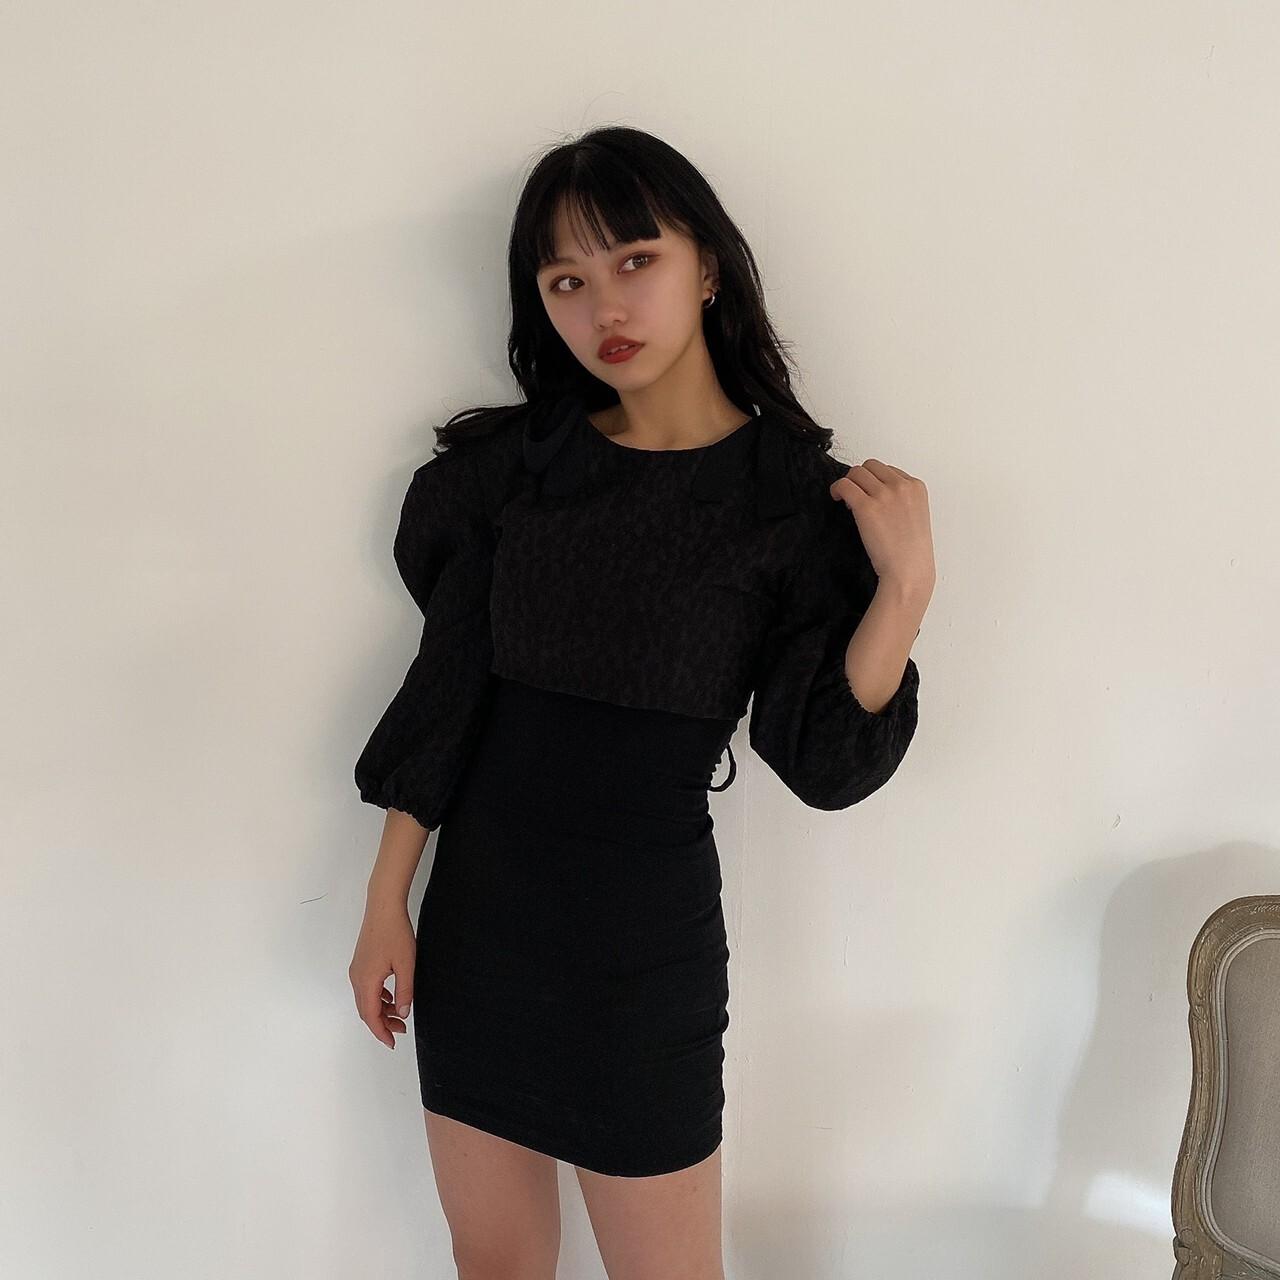 【Belle】LAST2 ribbon camisole onepiece / black